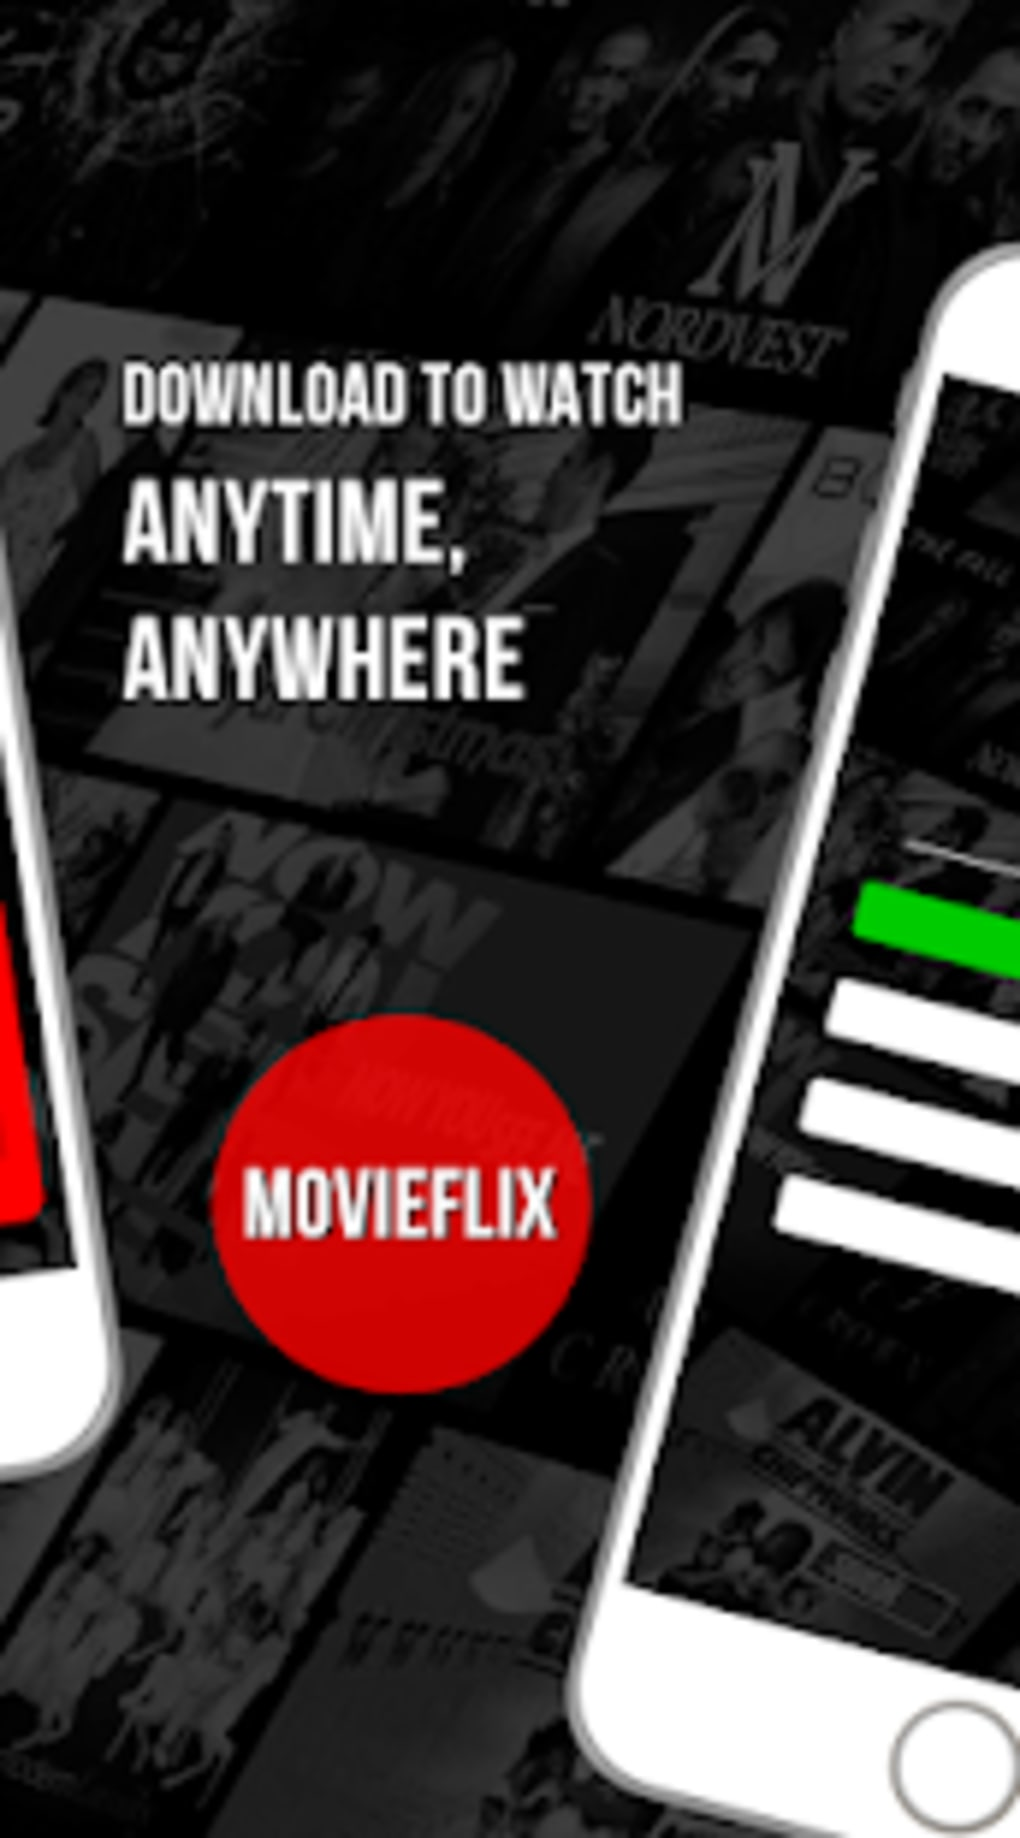 💣 Movieflix download | Install MovieFlix Kodi Addon  2019-07-01